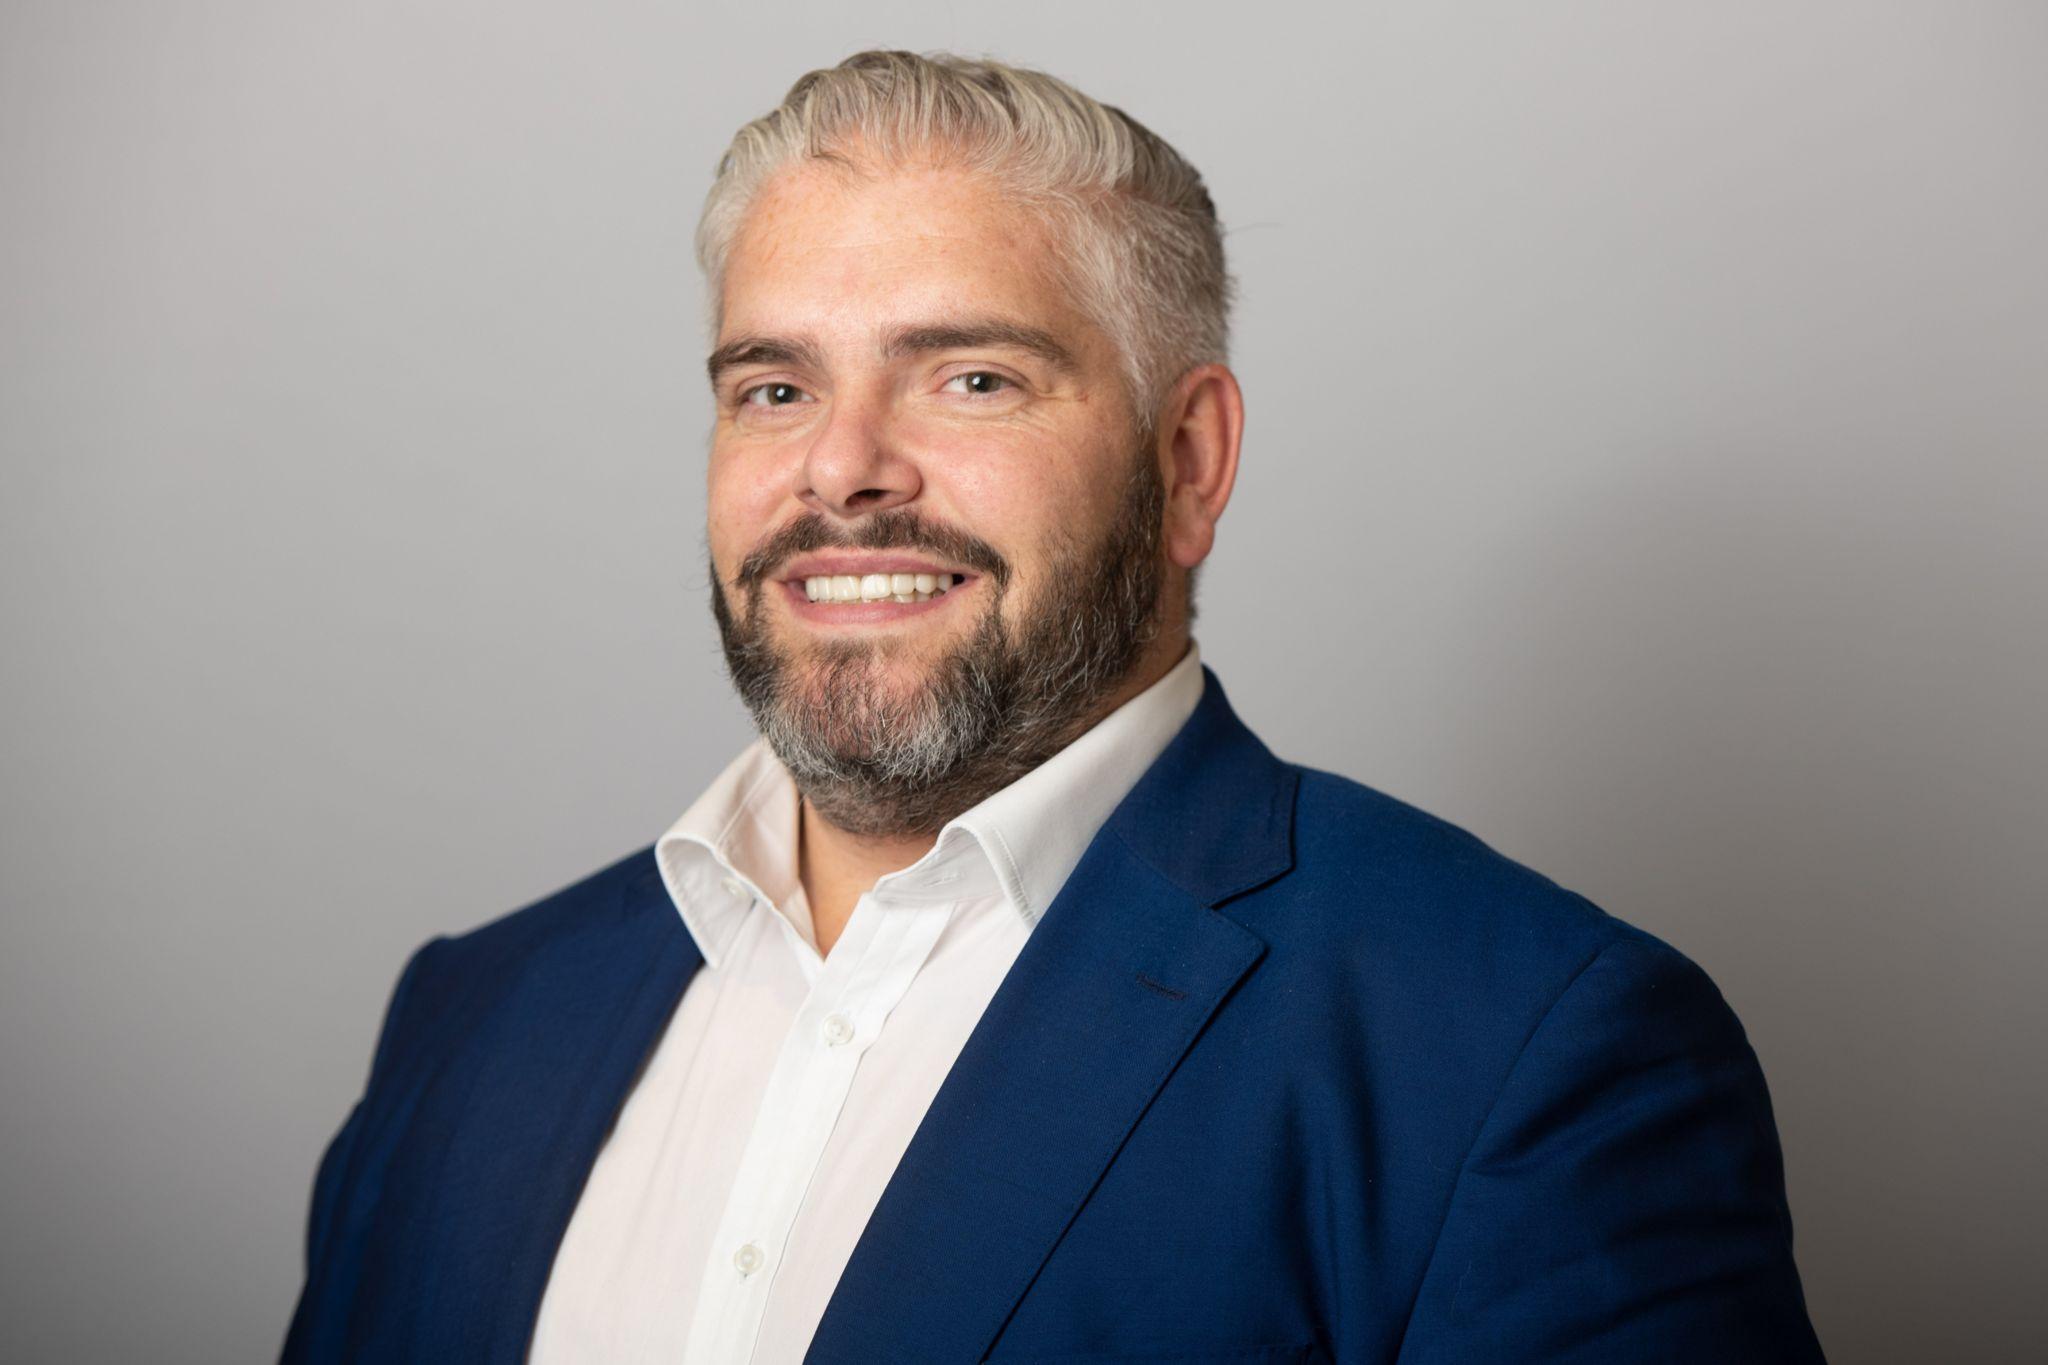 Luke Davis, chief executive of venture capital firm IW Capital